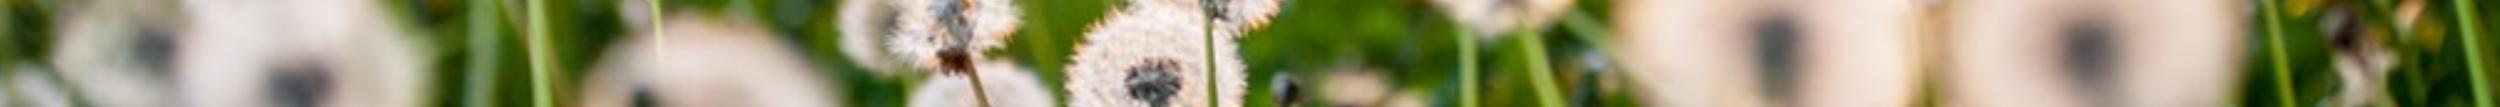 dandelion footer 2.png